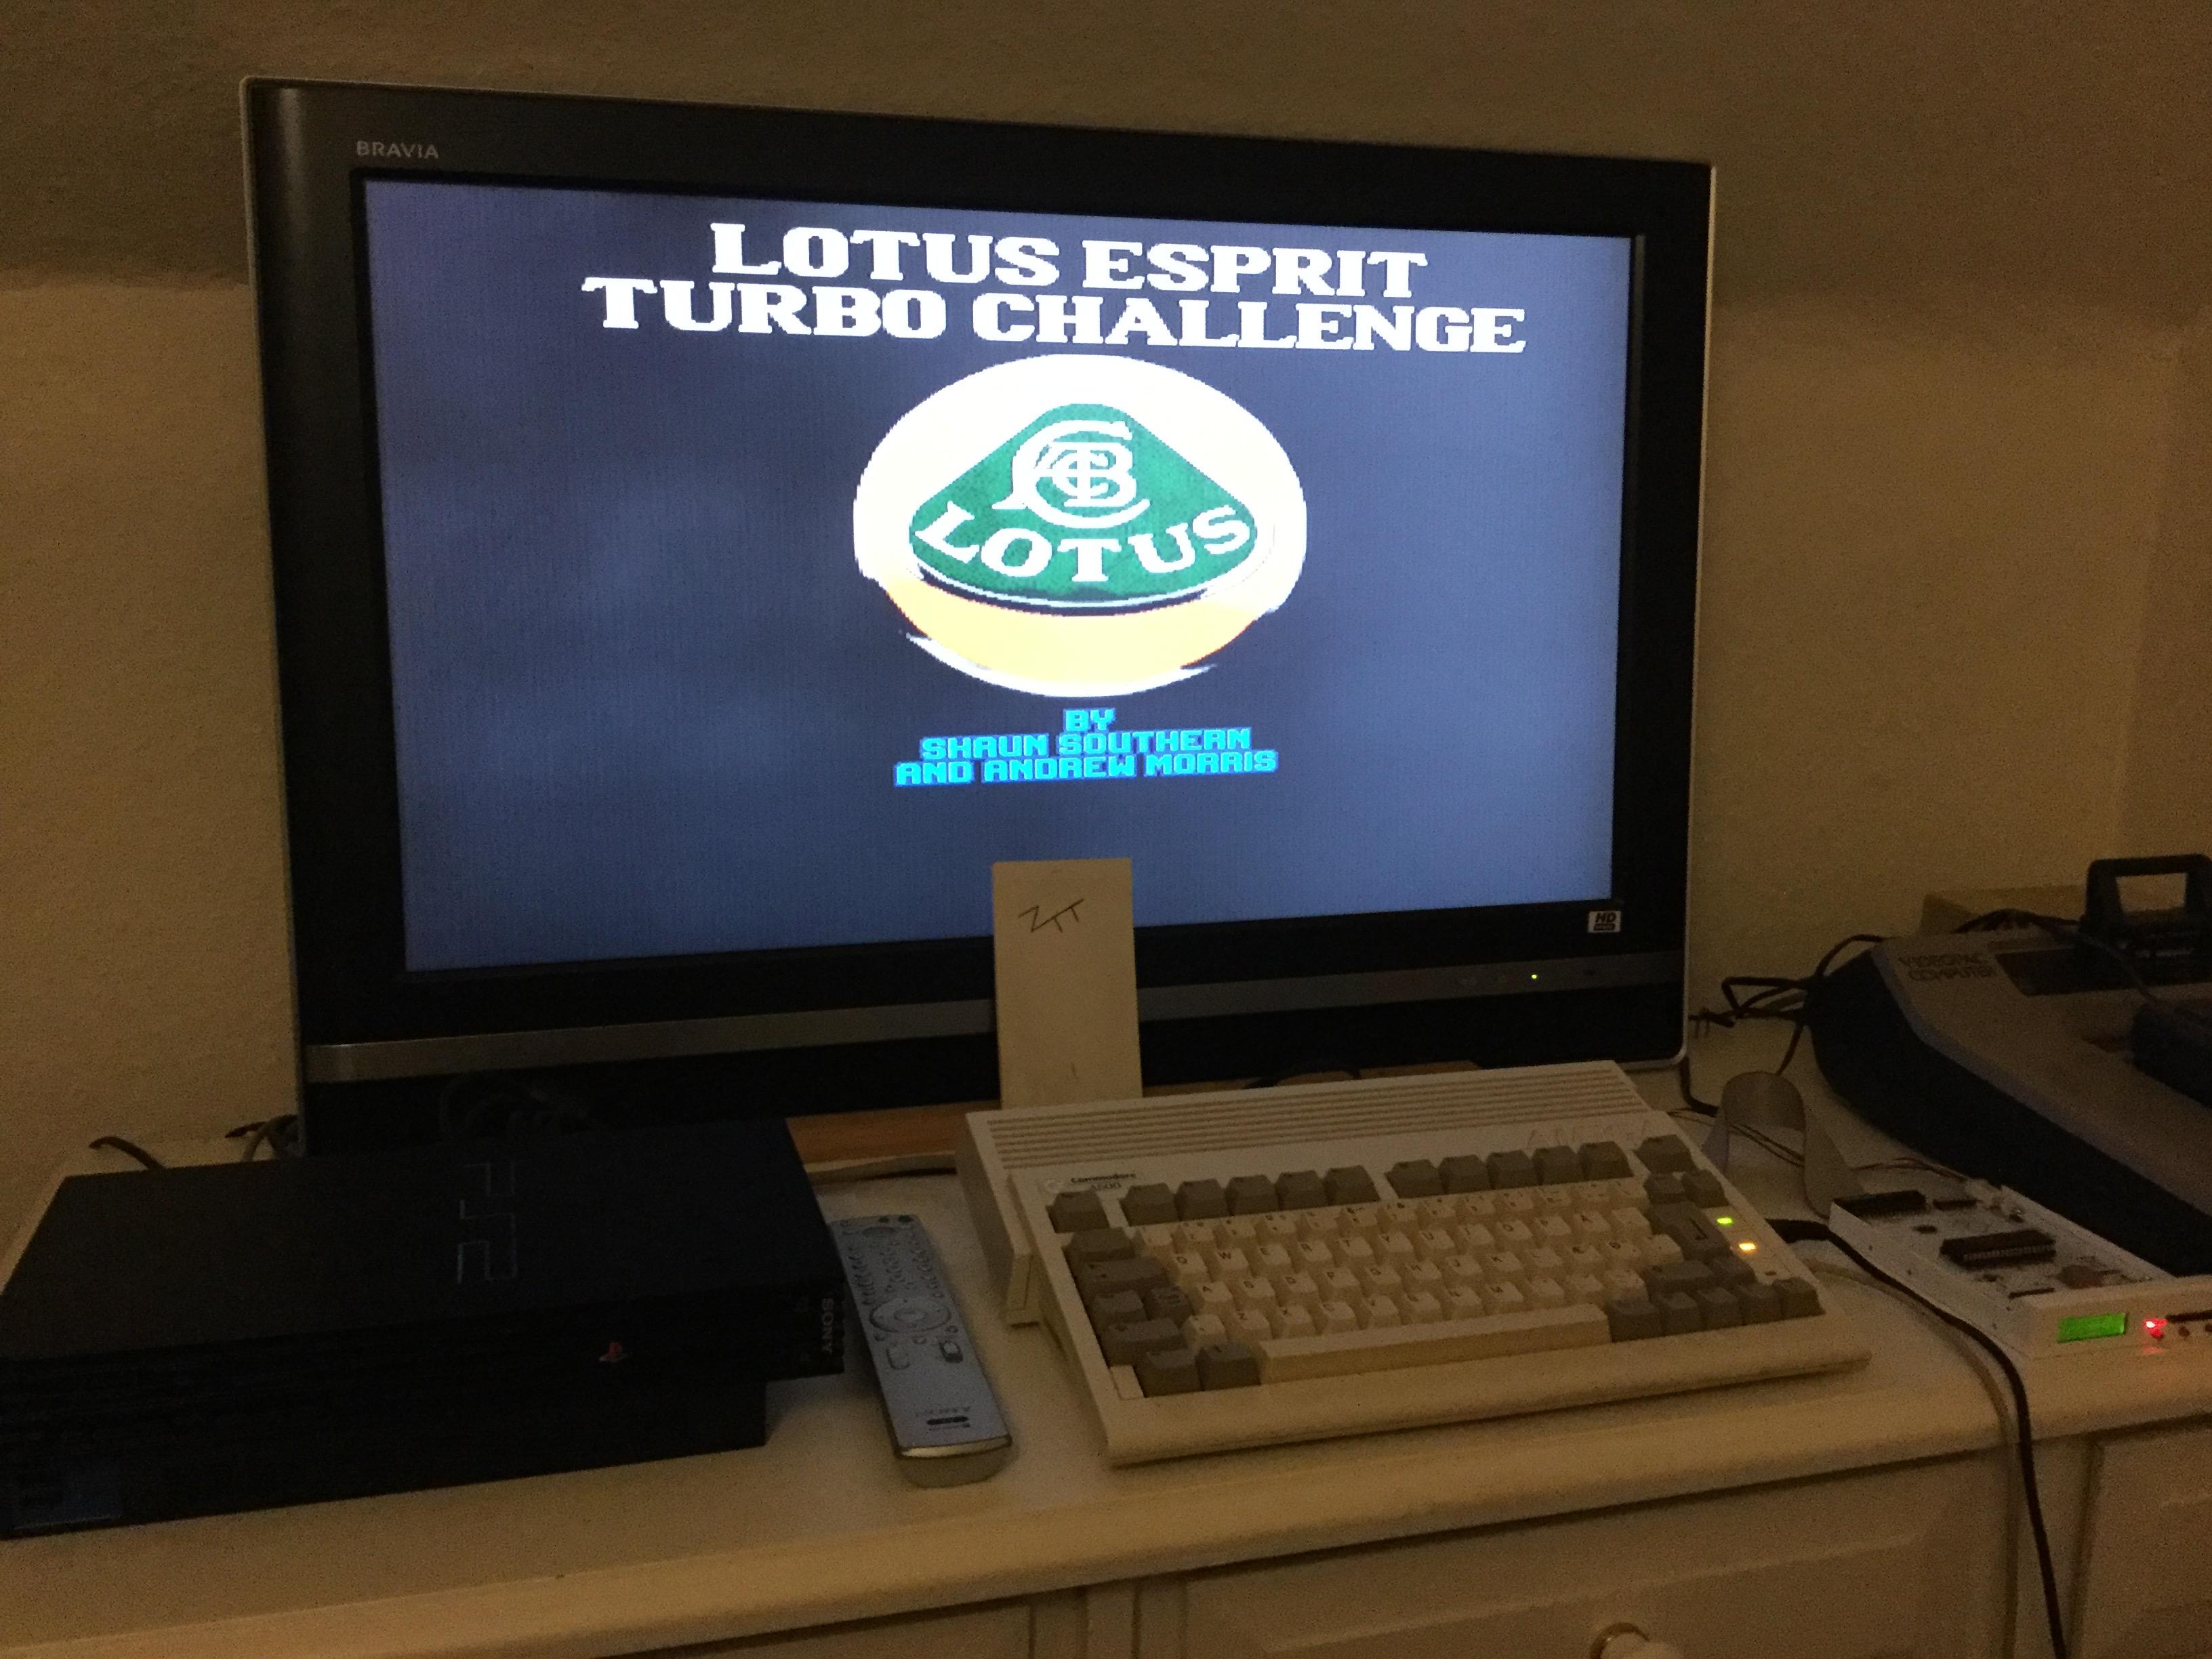 Frankie: Lotus Esprit Turbo Challenge [Easy]: [England] (Amiga) 0:03:45.6 points on 2017-12-01 12:42:33